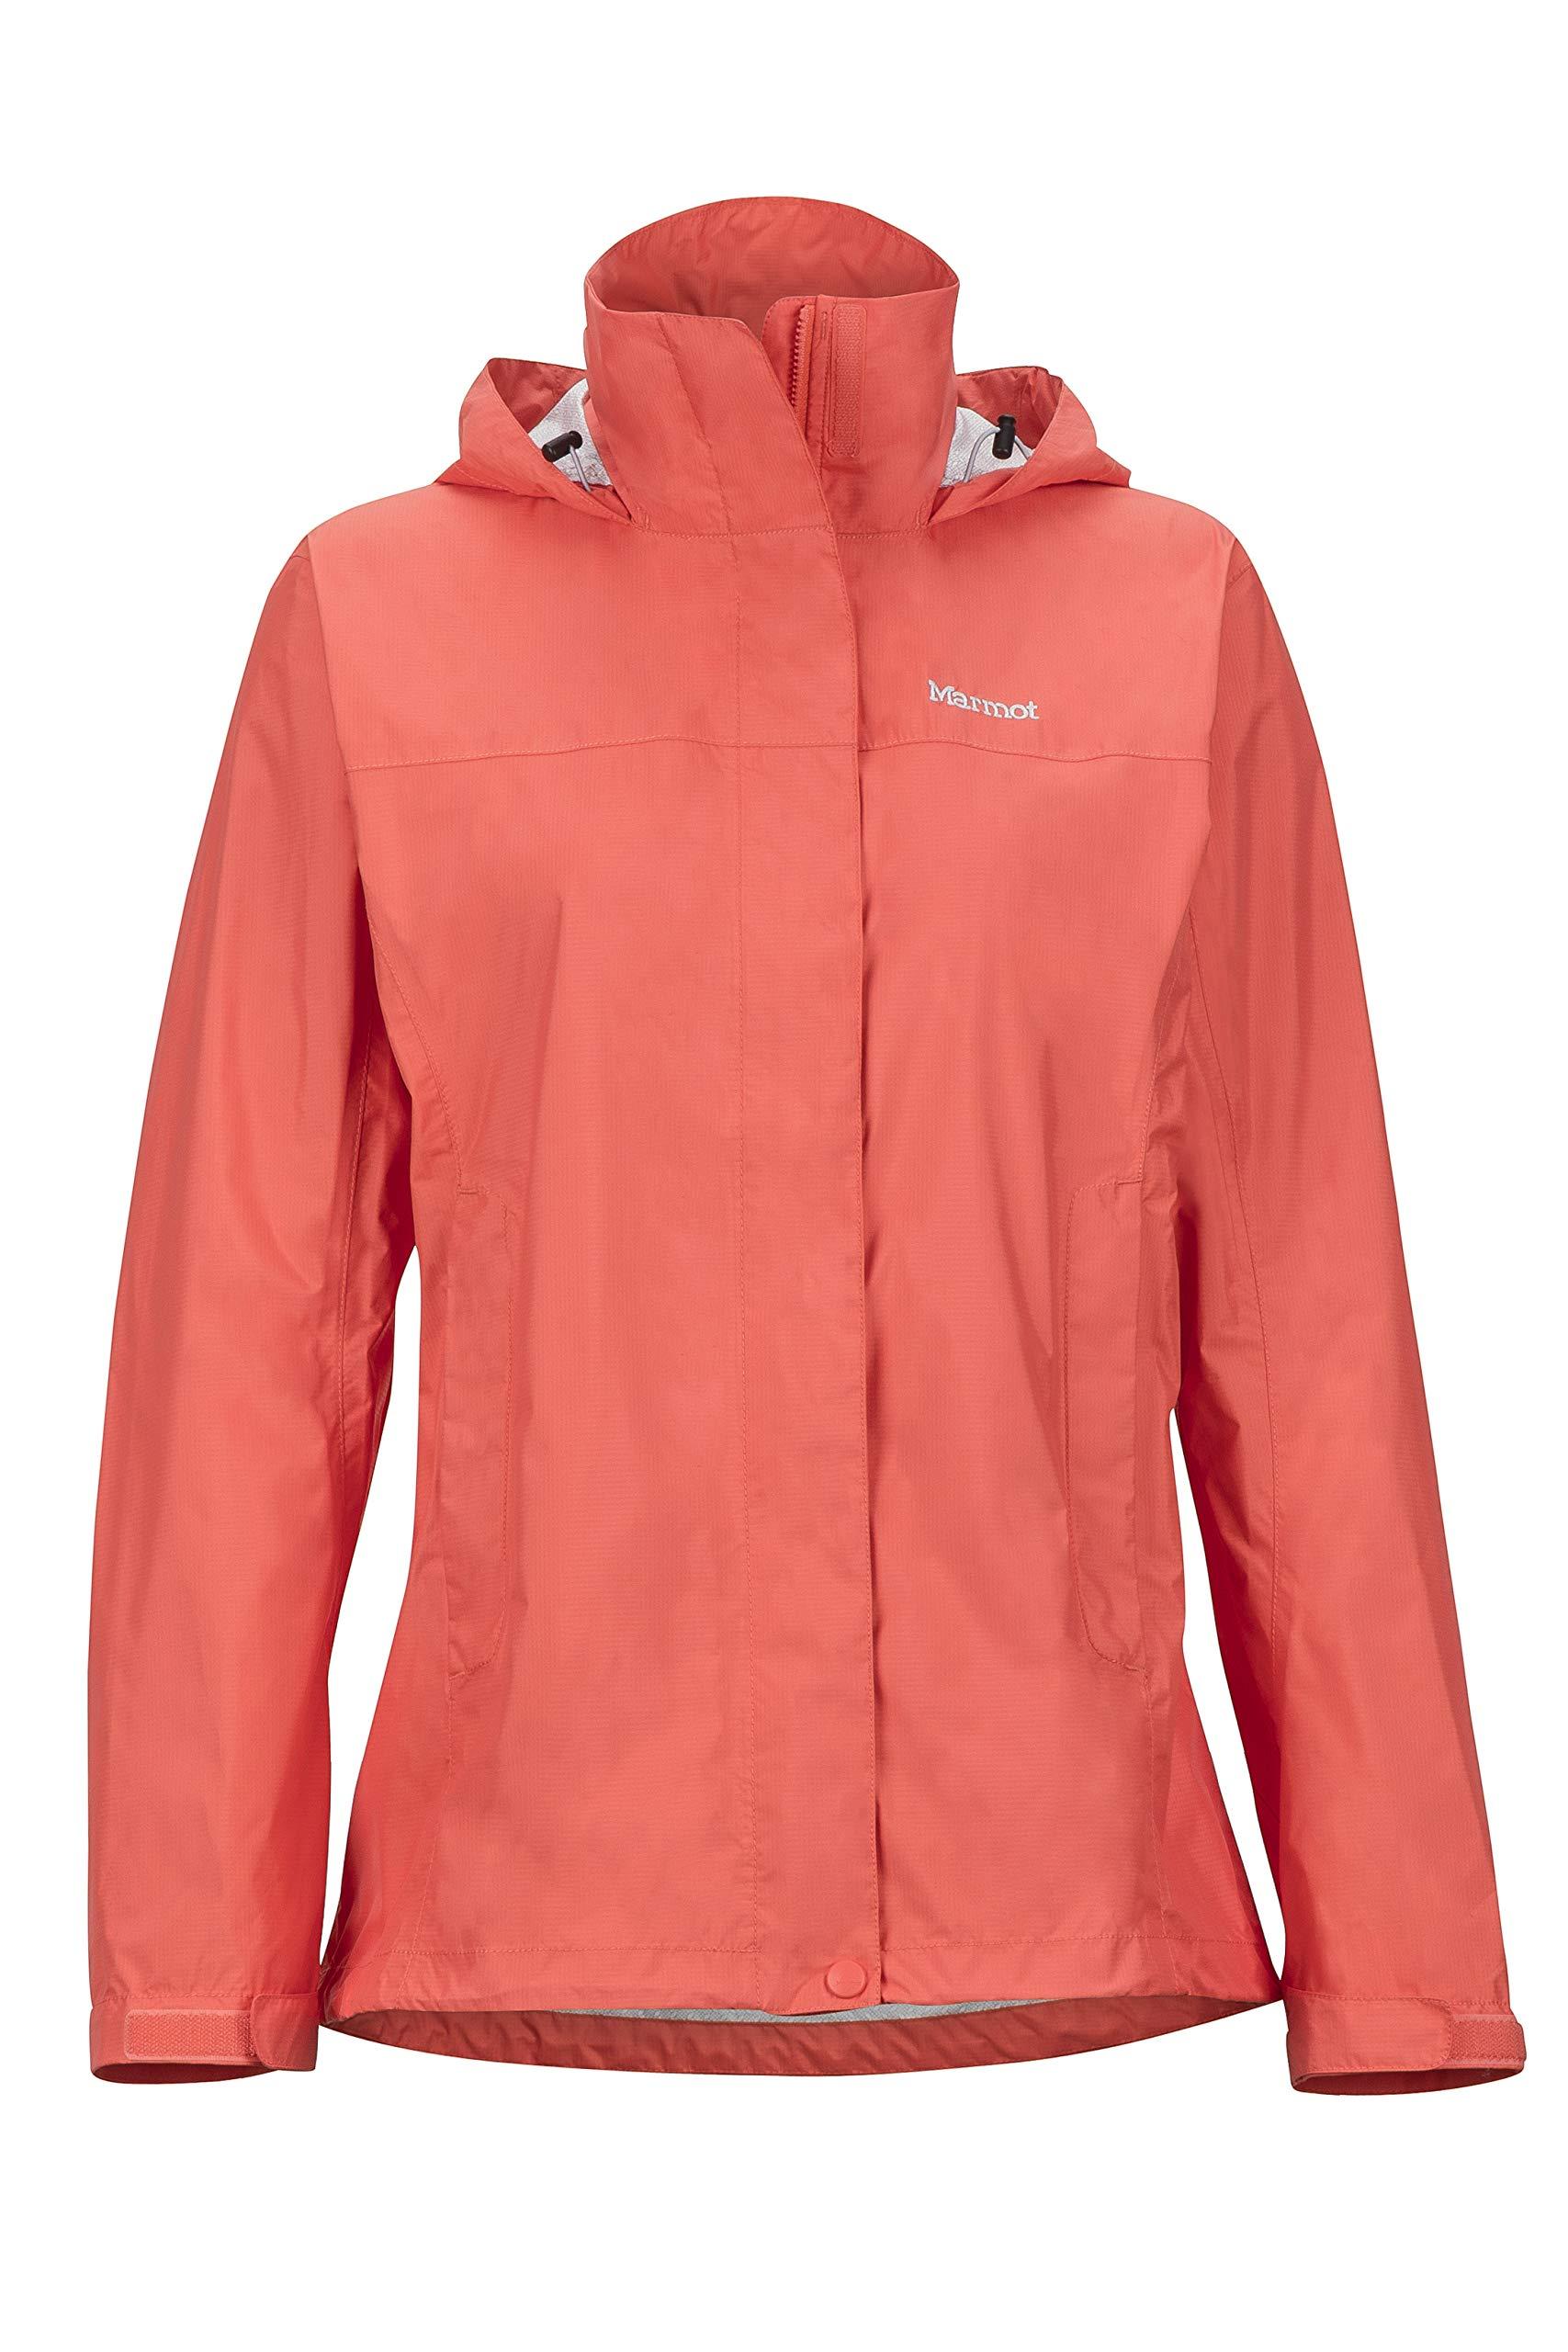 Marmot womens Precip Lightweight Waterproof Rain Jacket